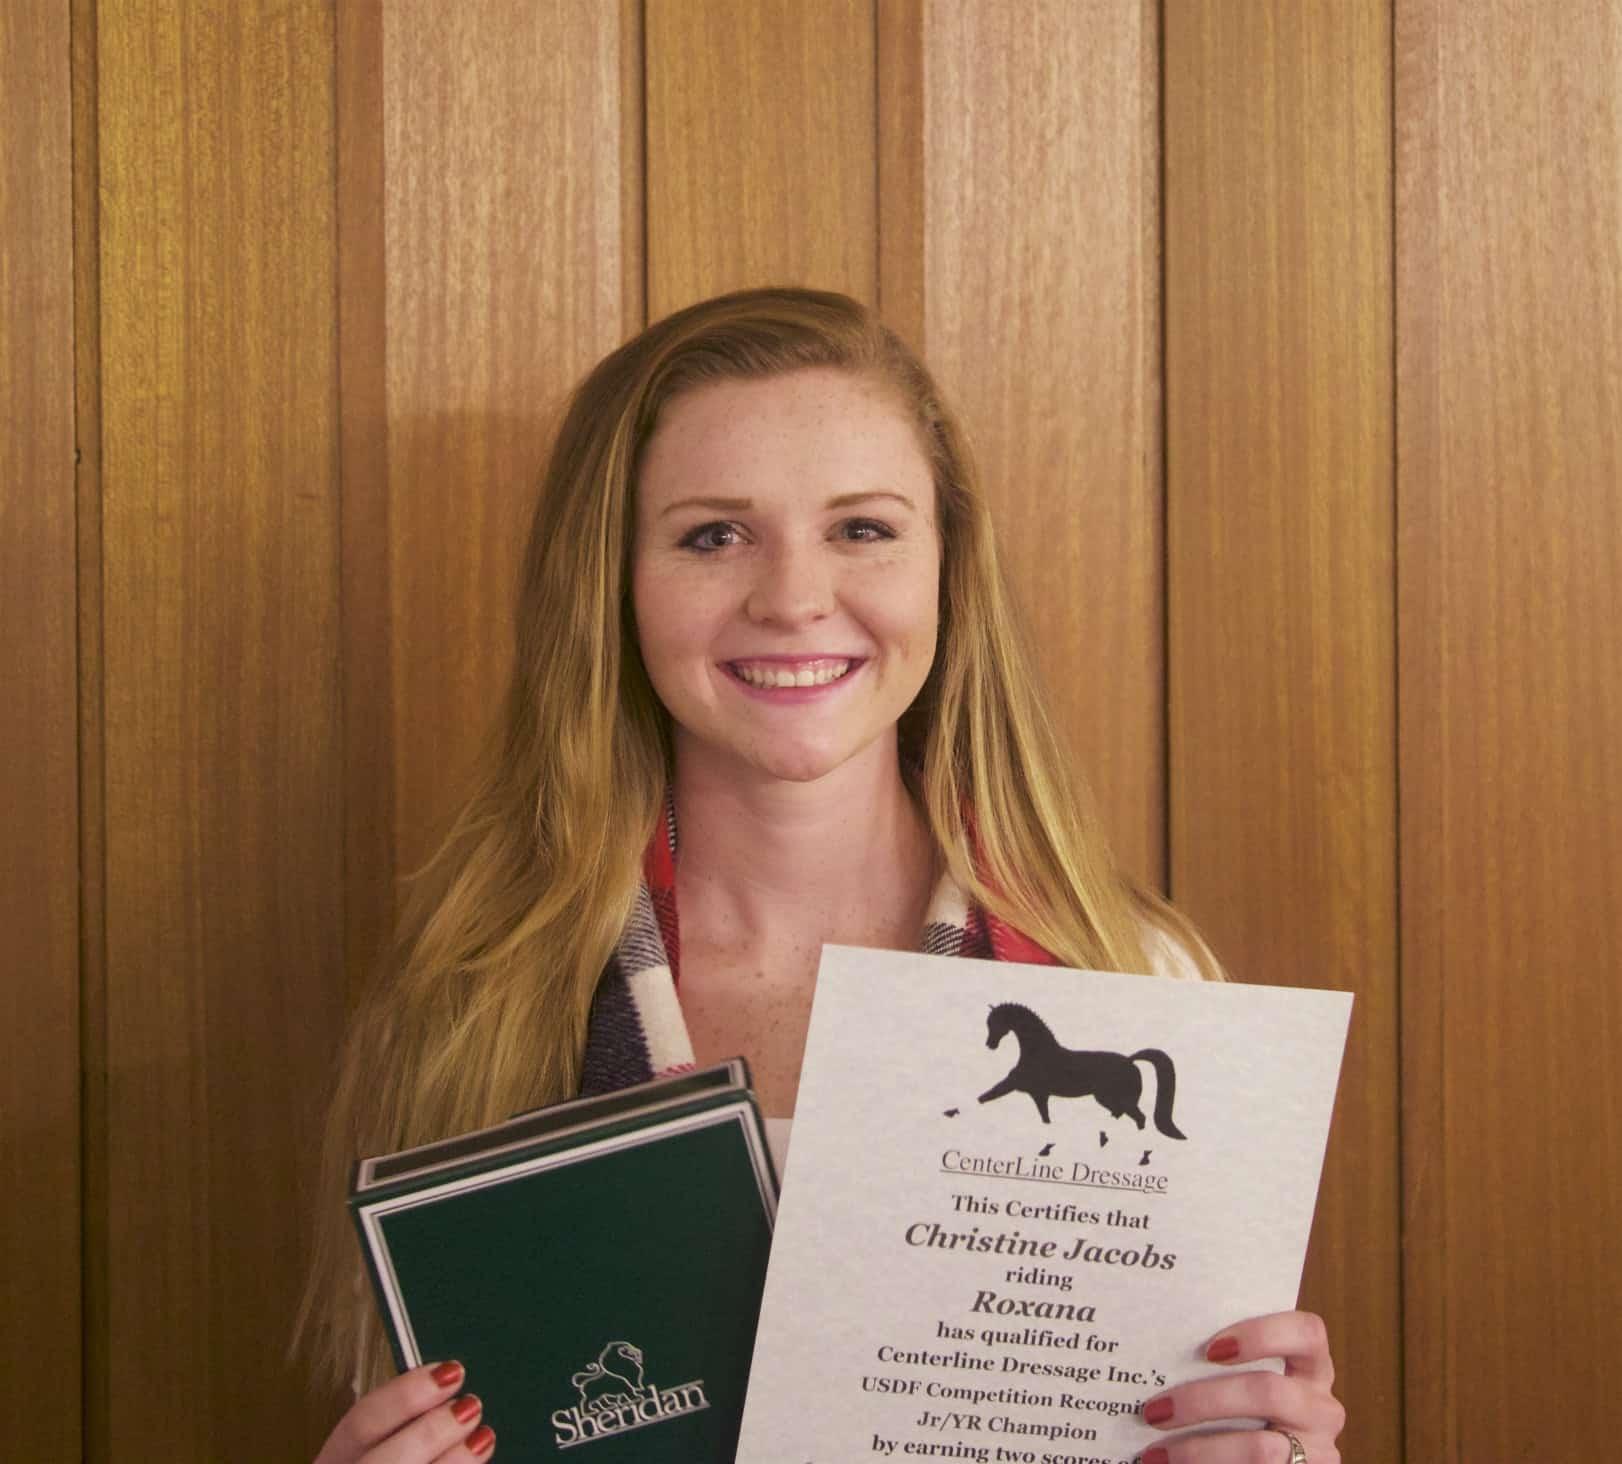 Christine Jacobs accepts an award